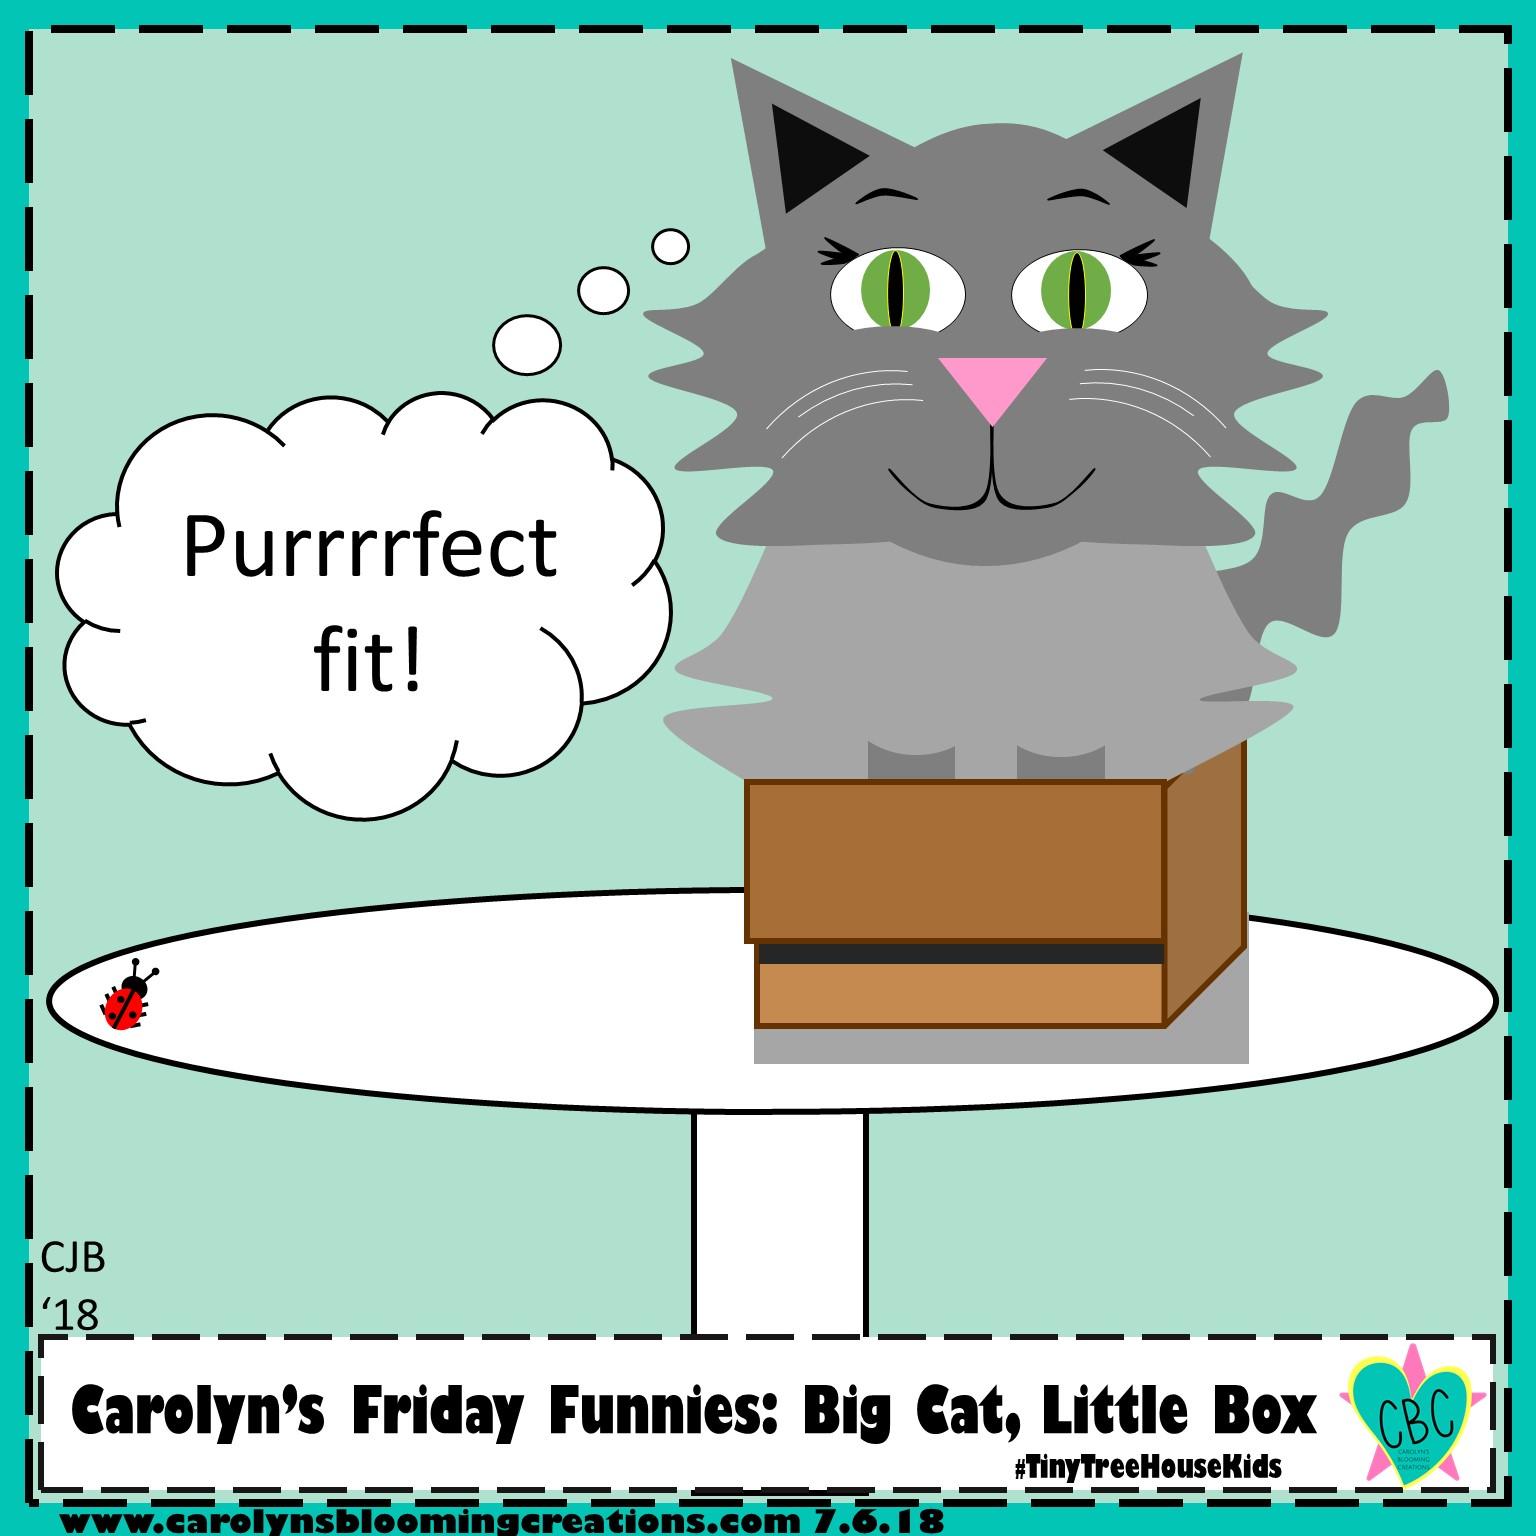 Carolyn Braden Friday Funny Big Cat Little Box 2019.jpg